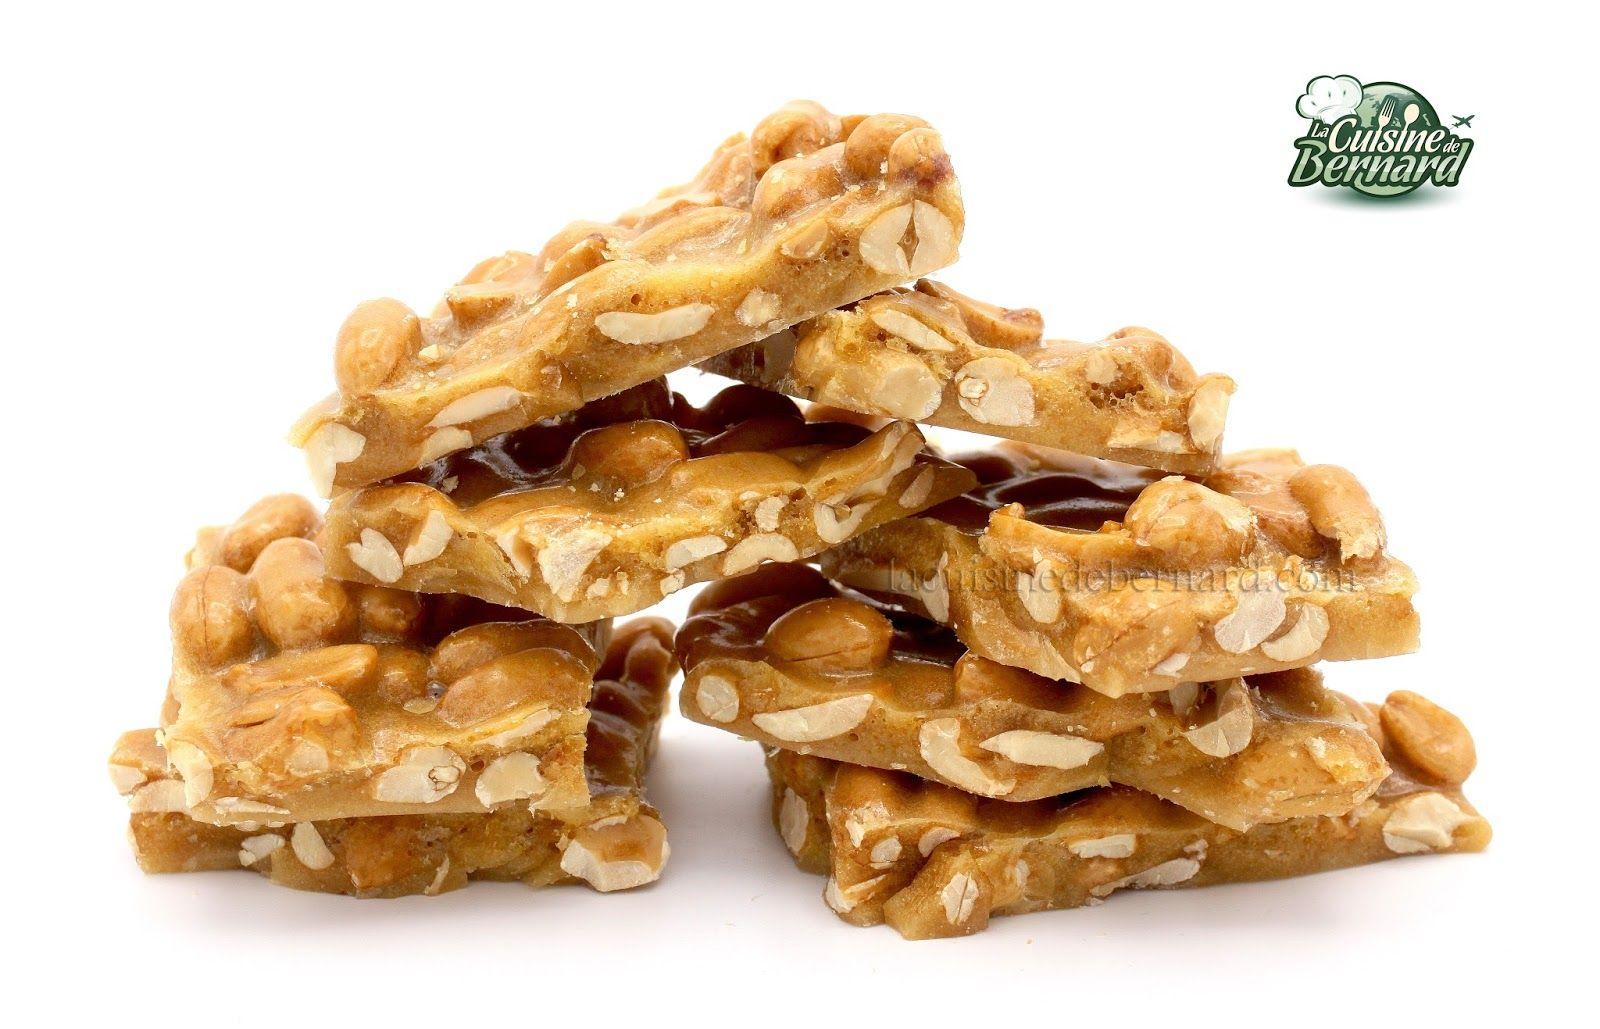 La Cuisine de Bernard  Peanut Brittle  Only Peanut butter  Pinterest  Peanut brittle